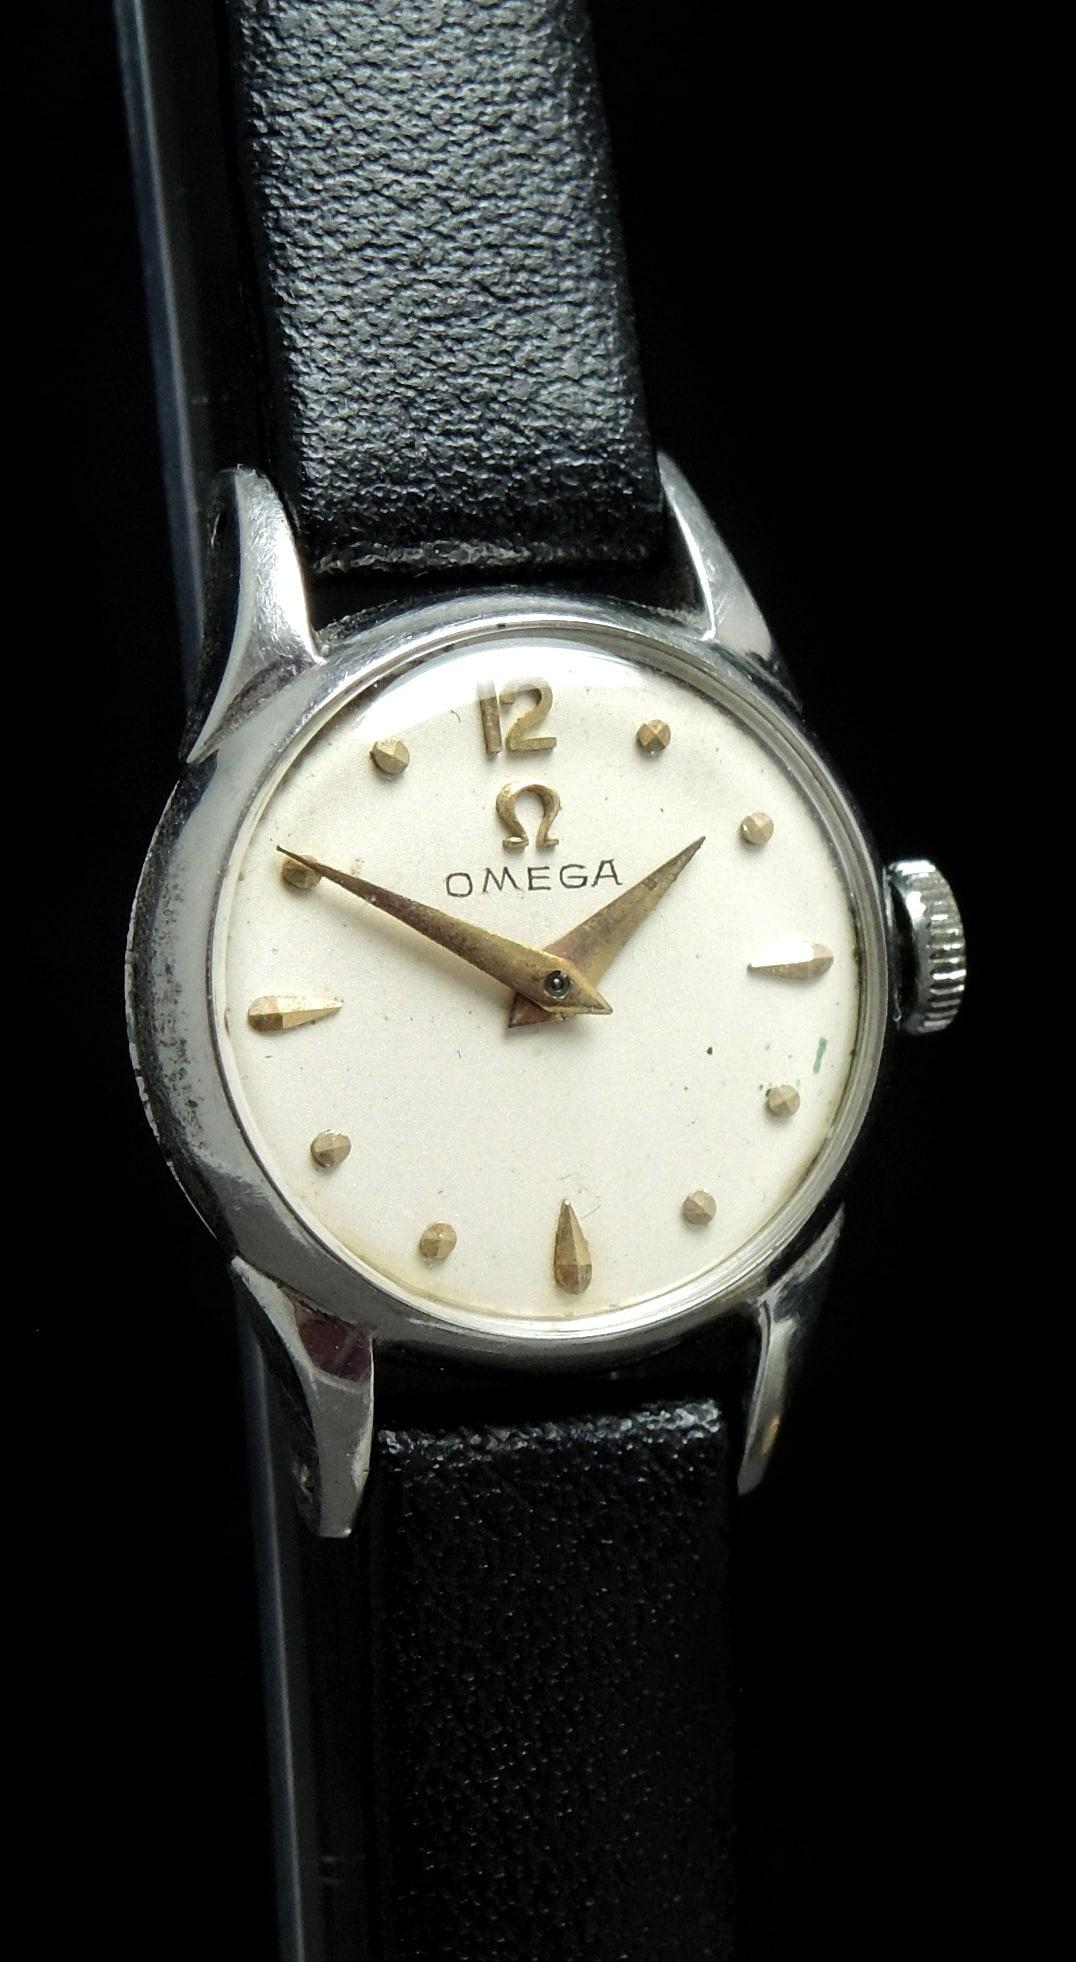 Small omega ladies watch vintage vintage portfolio for Omega watch vintage